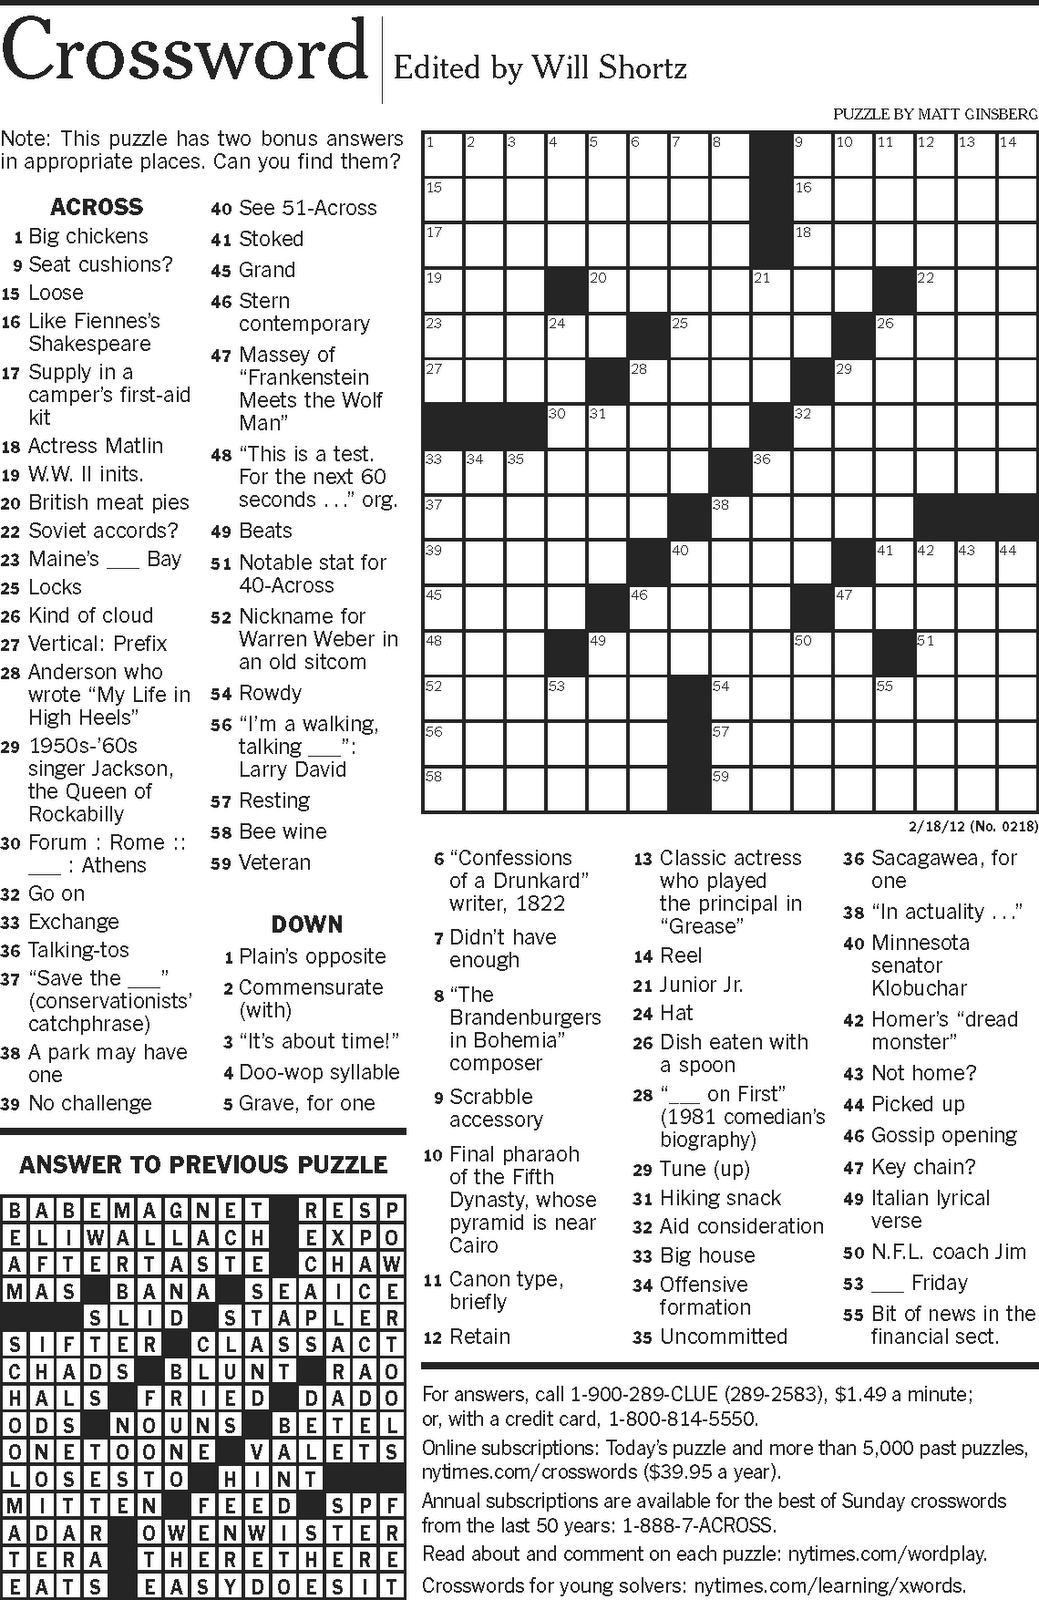 economic terms crossword answers Document read online economic terms crossword puzzle answers economic terms crossword puzzle answers - in this site.